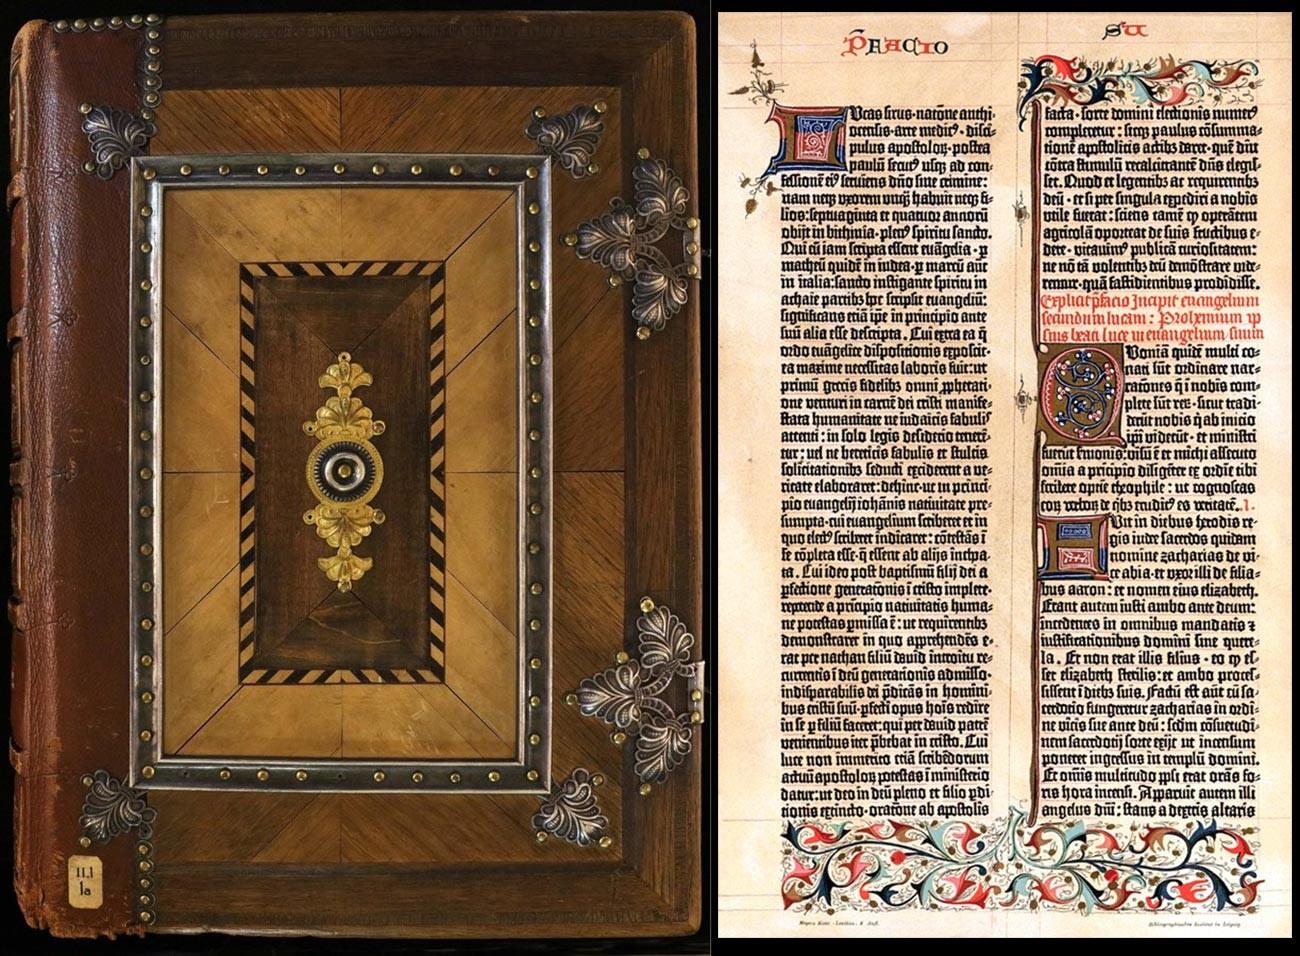 Die Gutenberg-Bibel